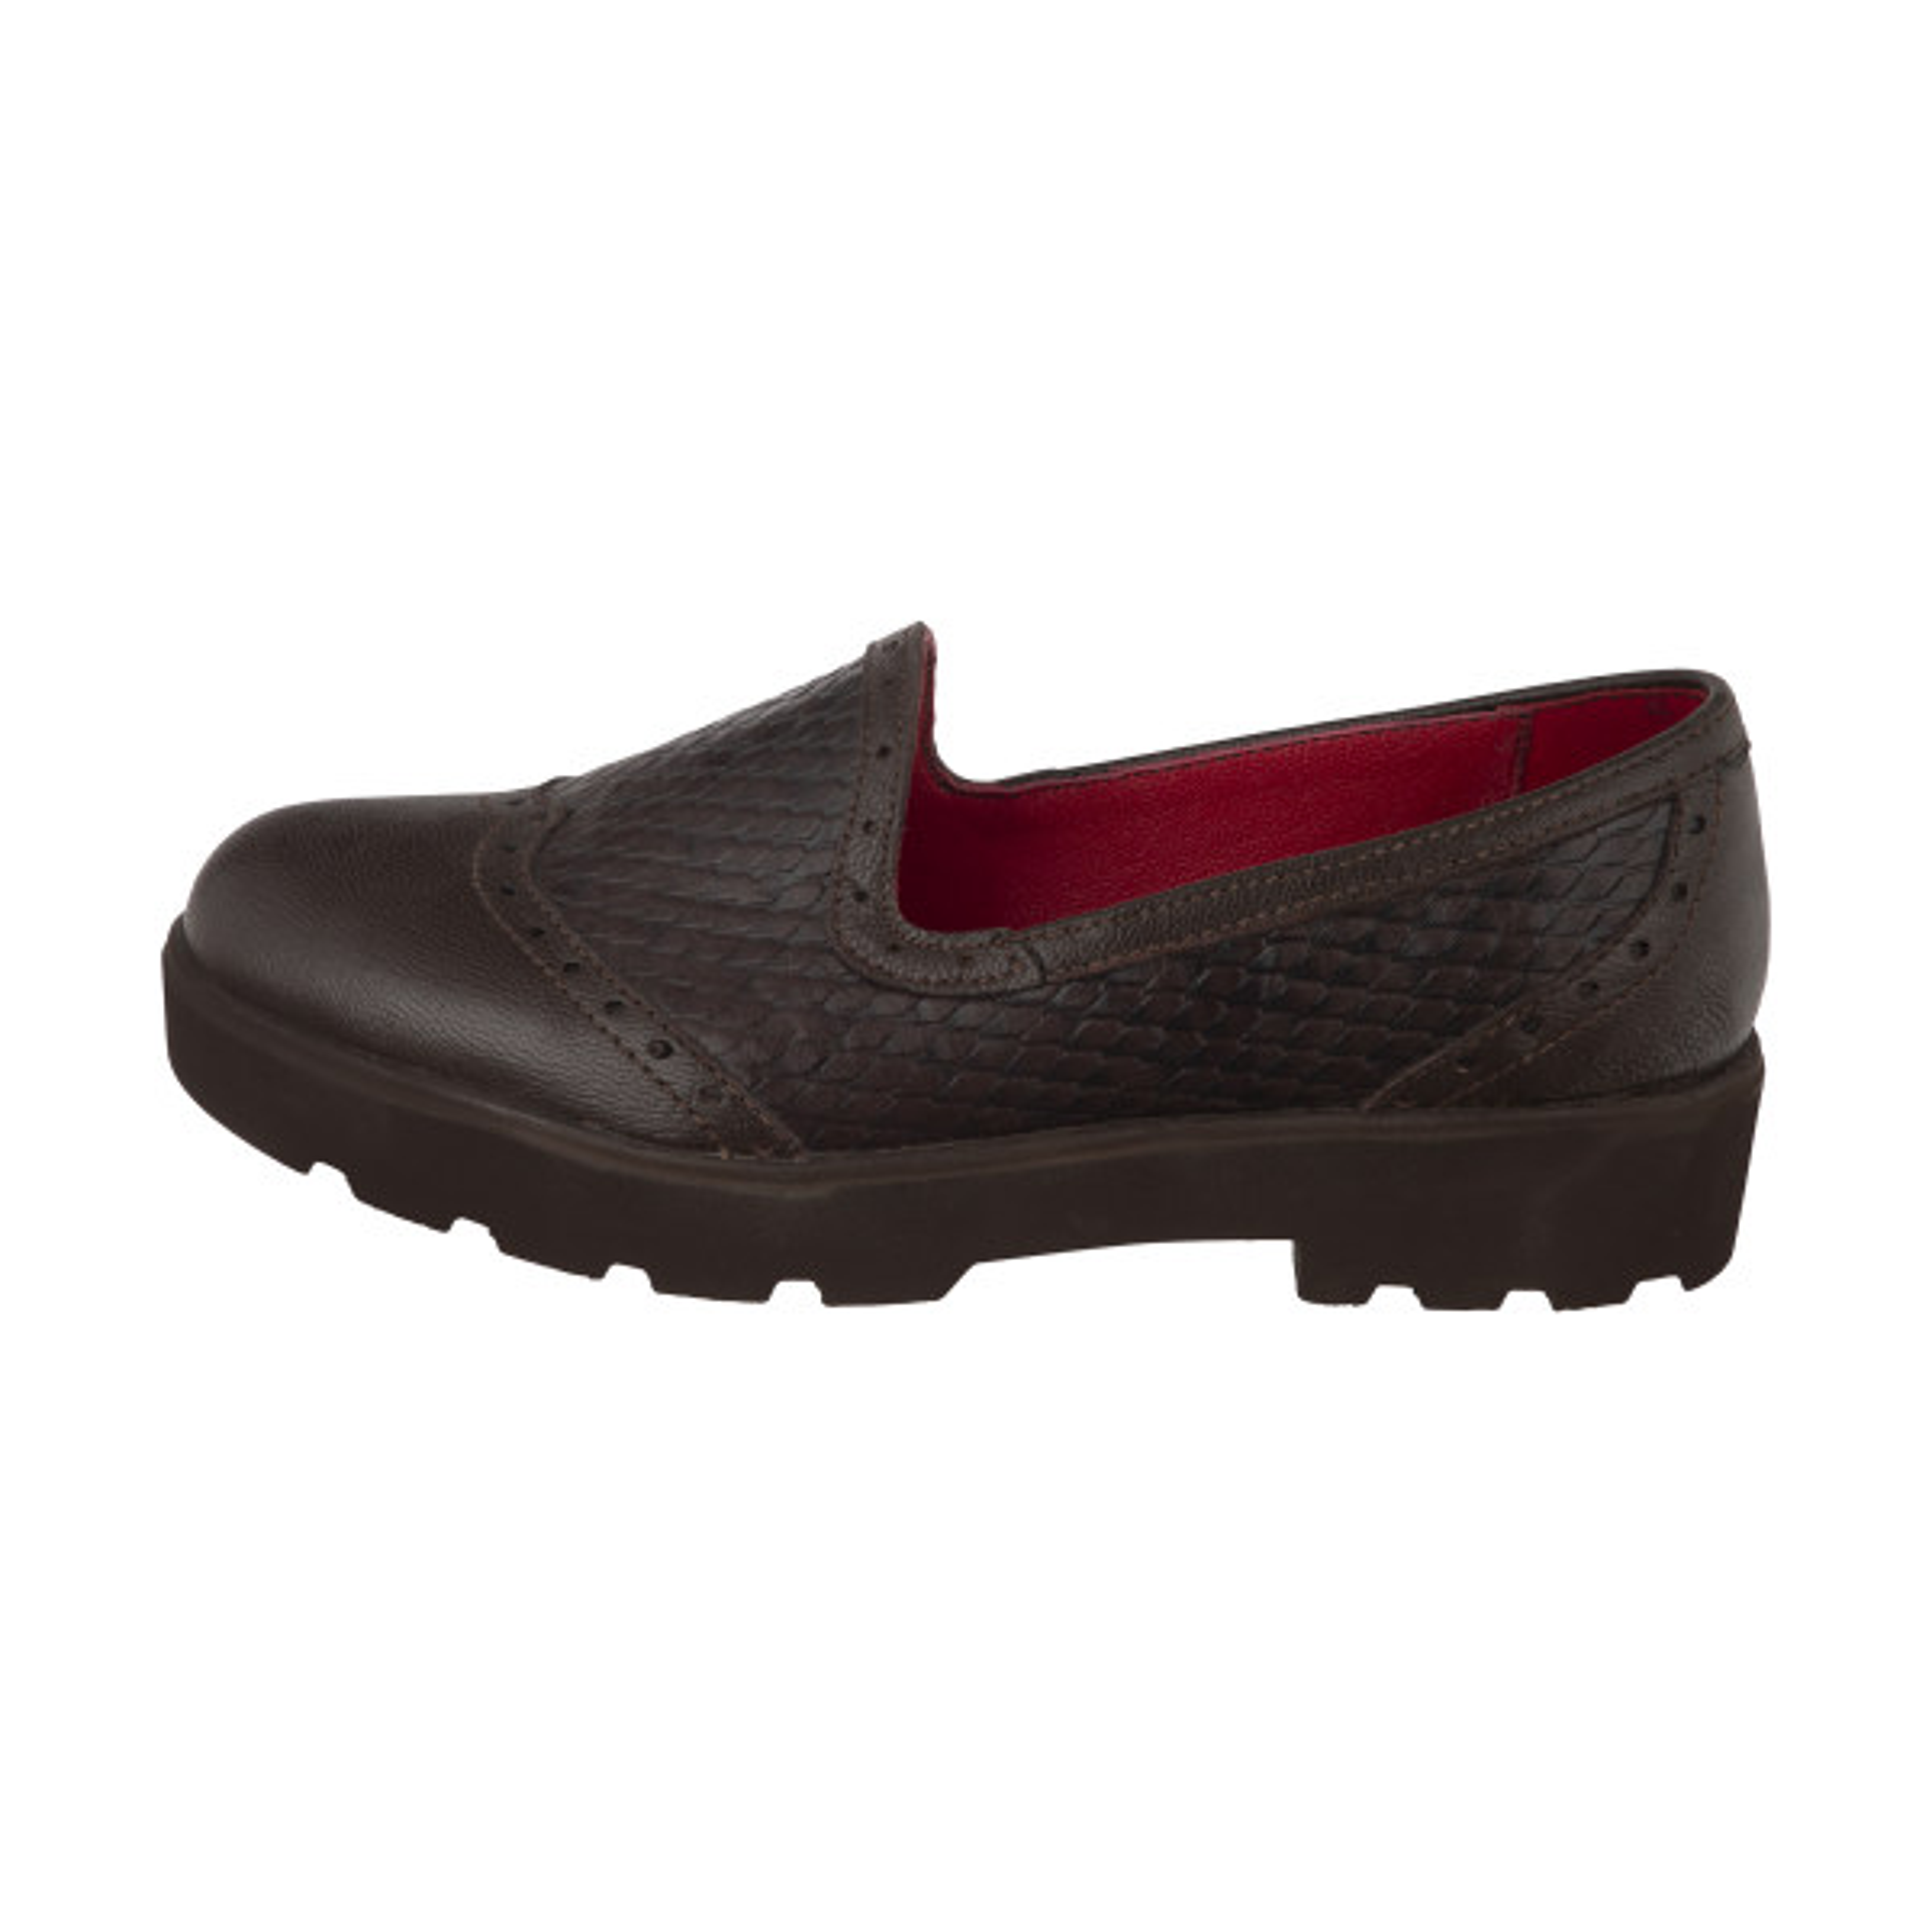 کفش روزمره زنانه ساتین مدل 5m07a500104